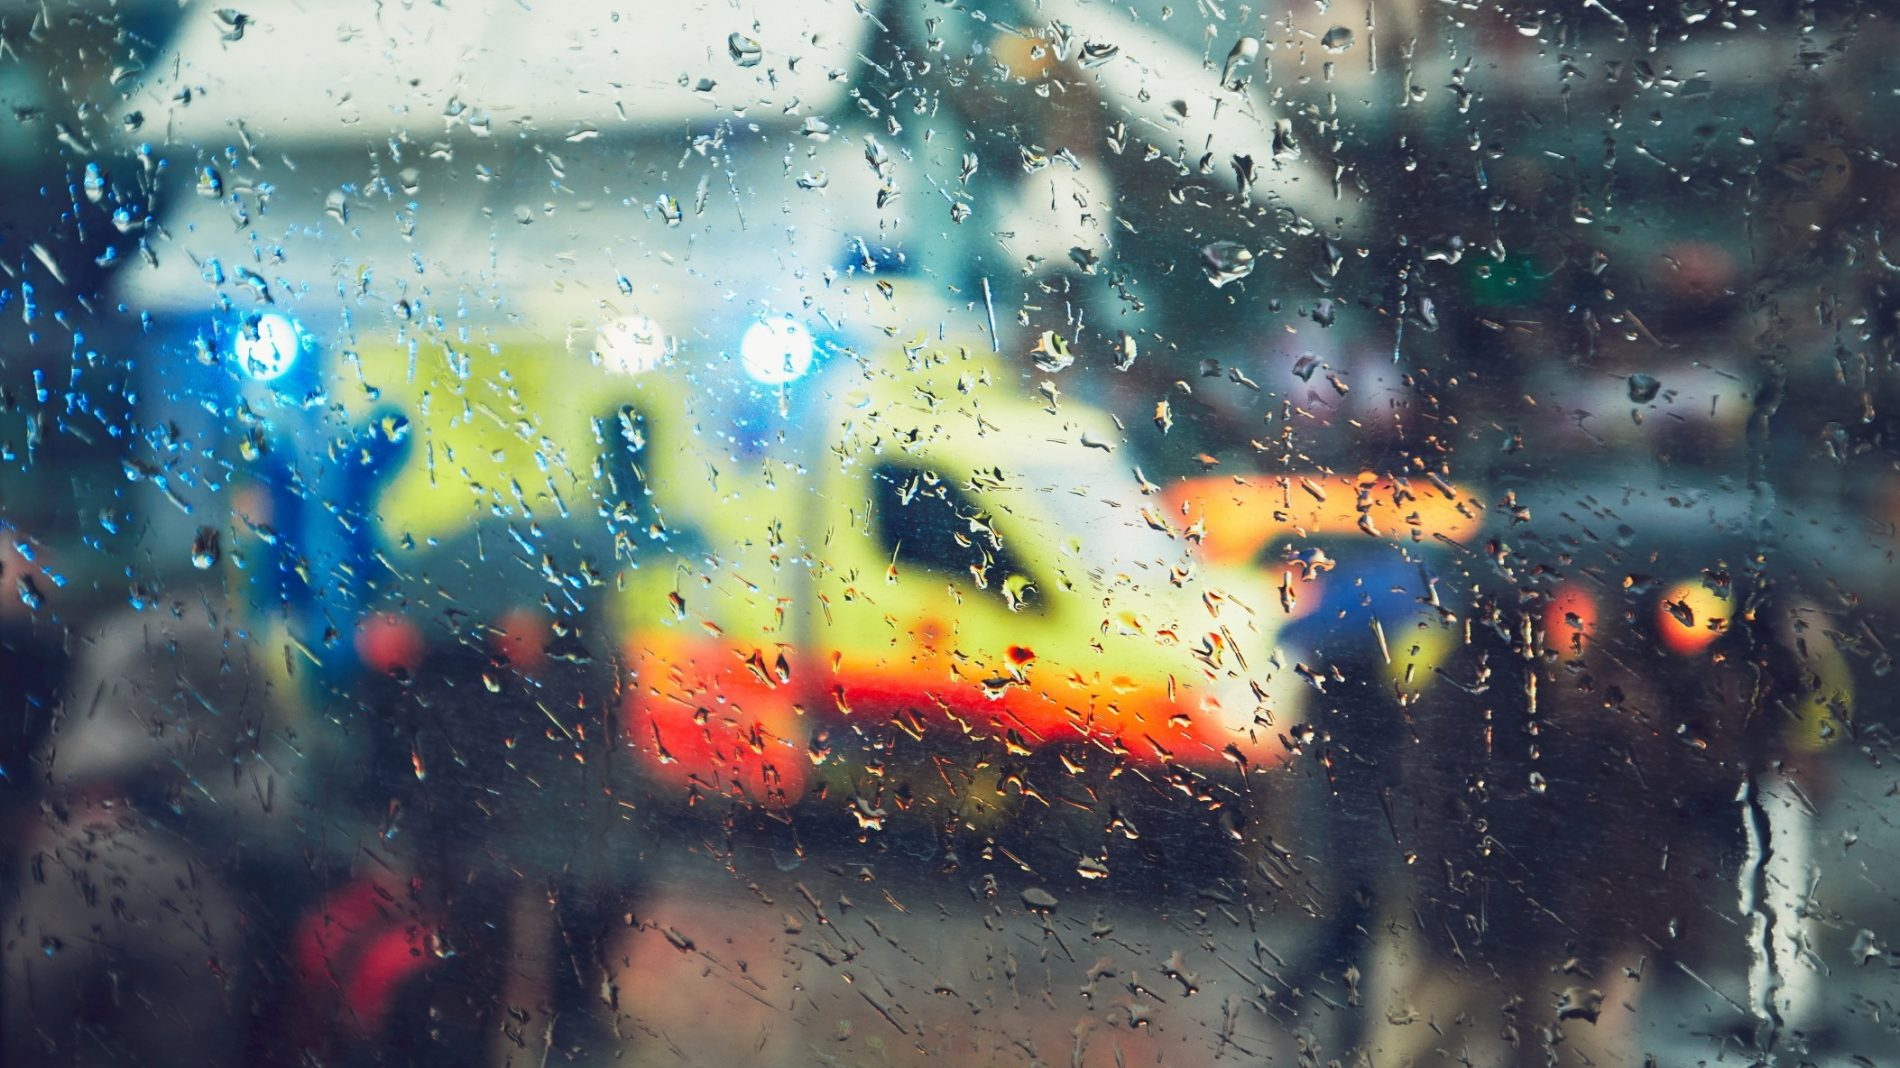 A photo of an ambulance through a rainy window